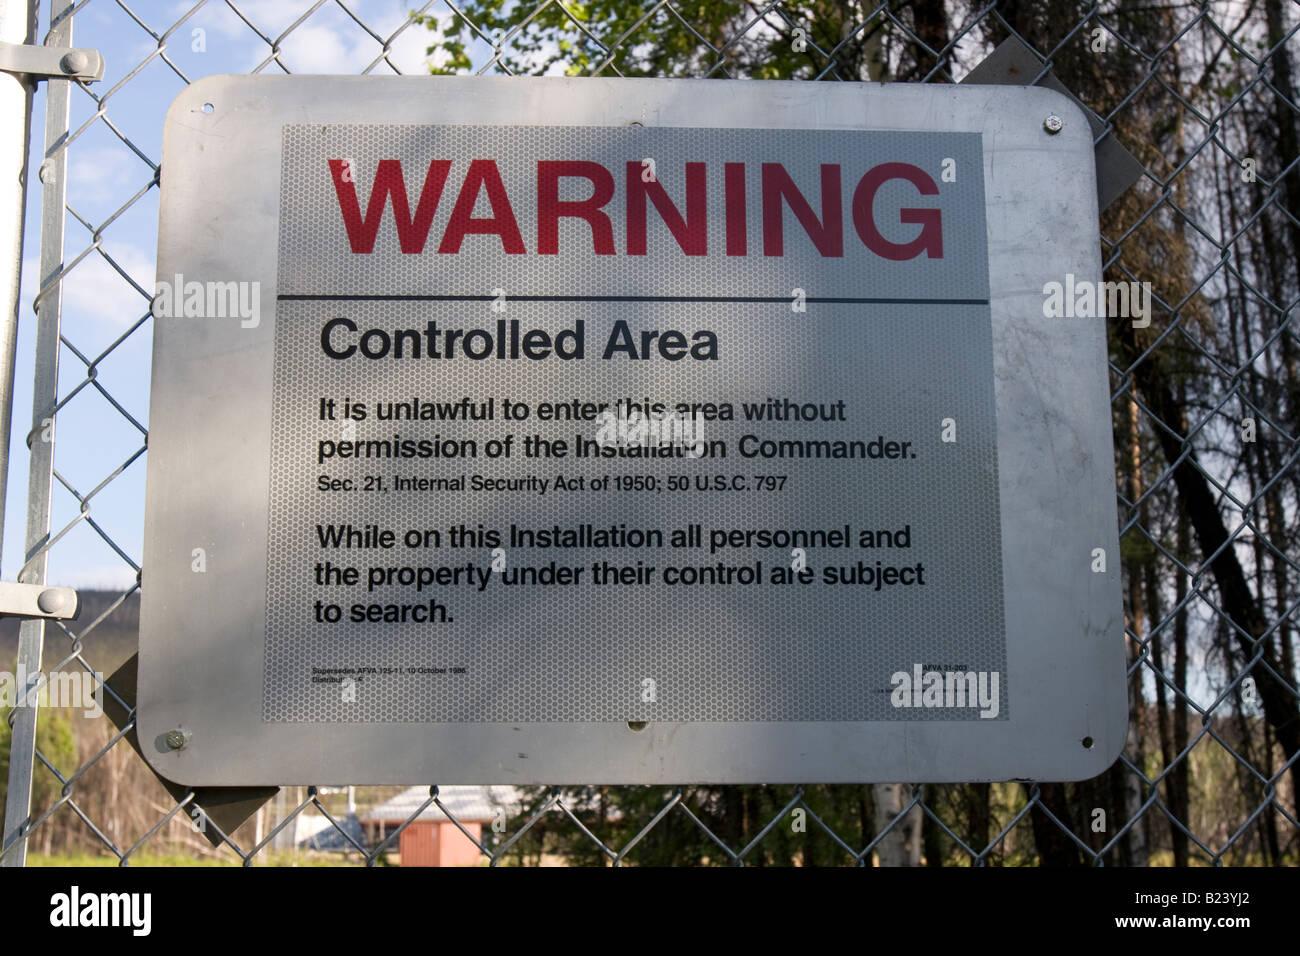 Warning sign on fence at Poker Flat Research Range, 30 mile Steese Highway, Fairbanks, Alaska - Stock Image